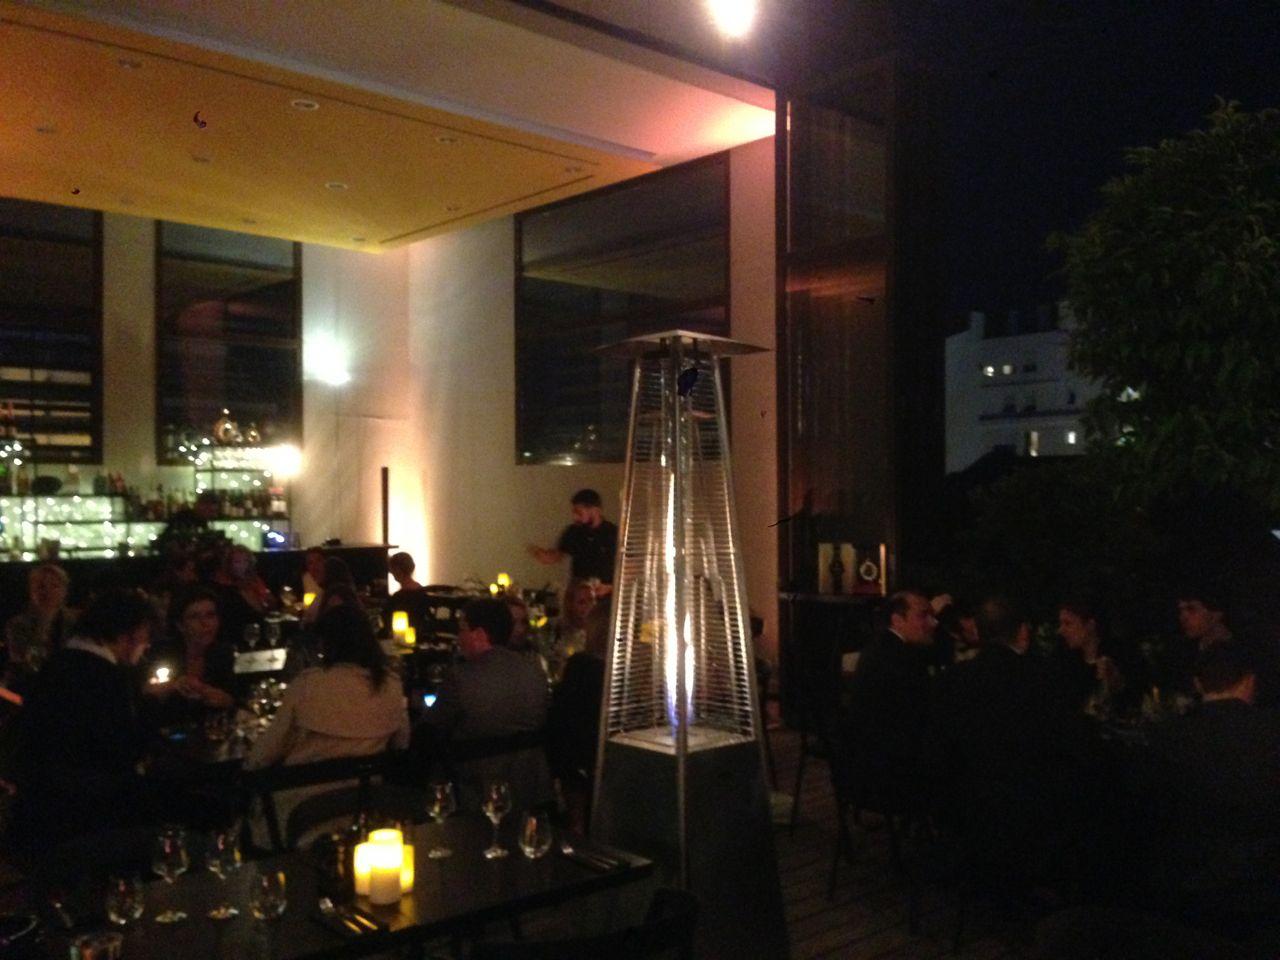 Impression of a cool bar at 67th Festival de Cannes